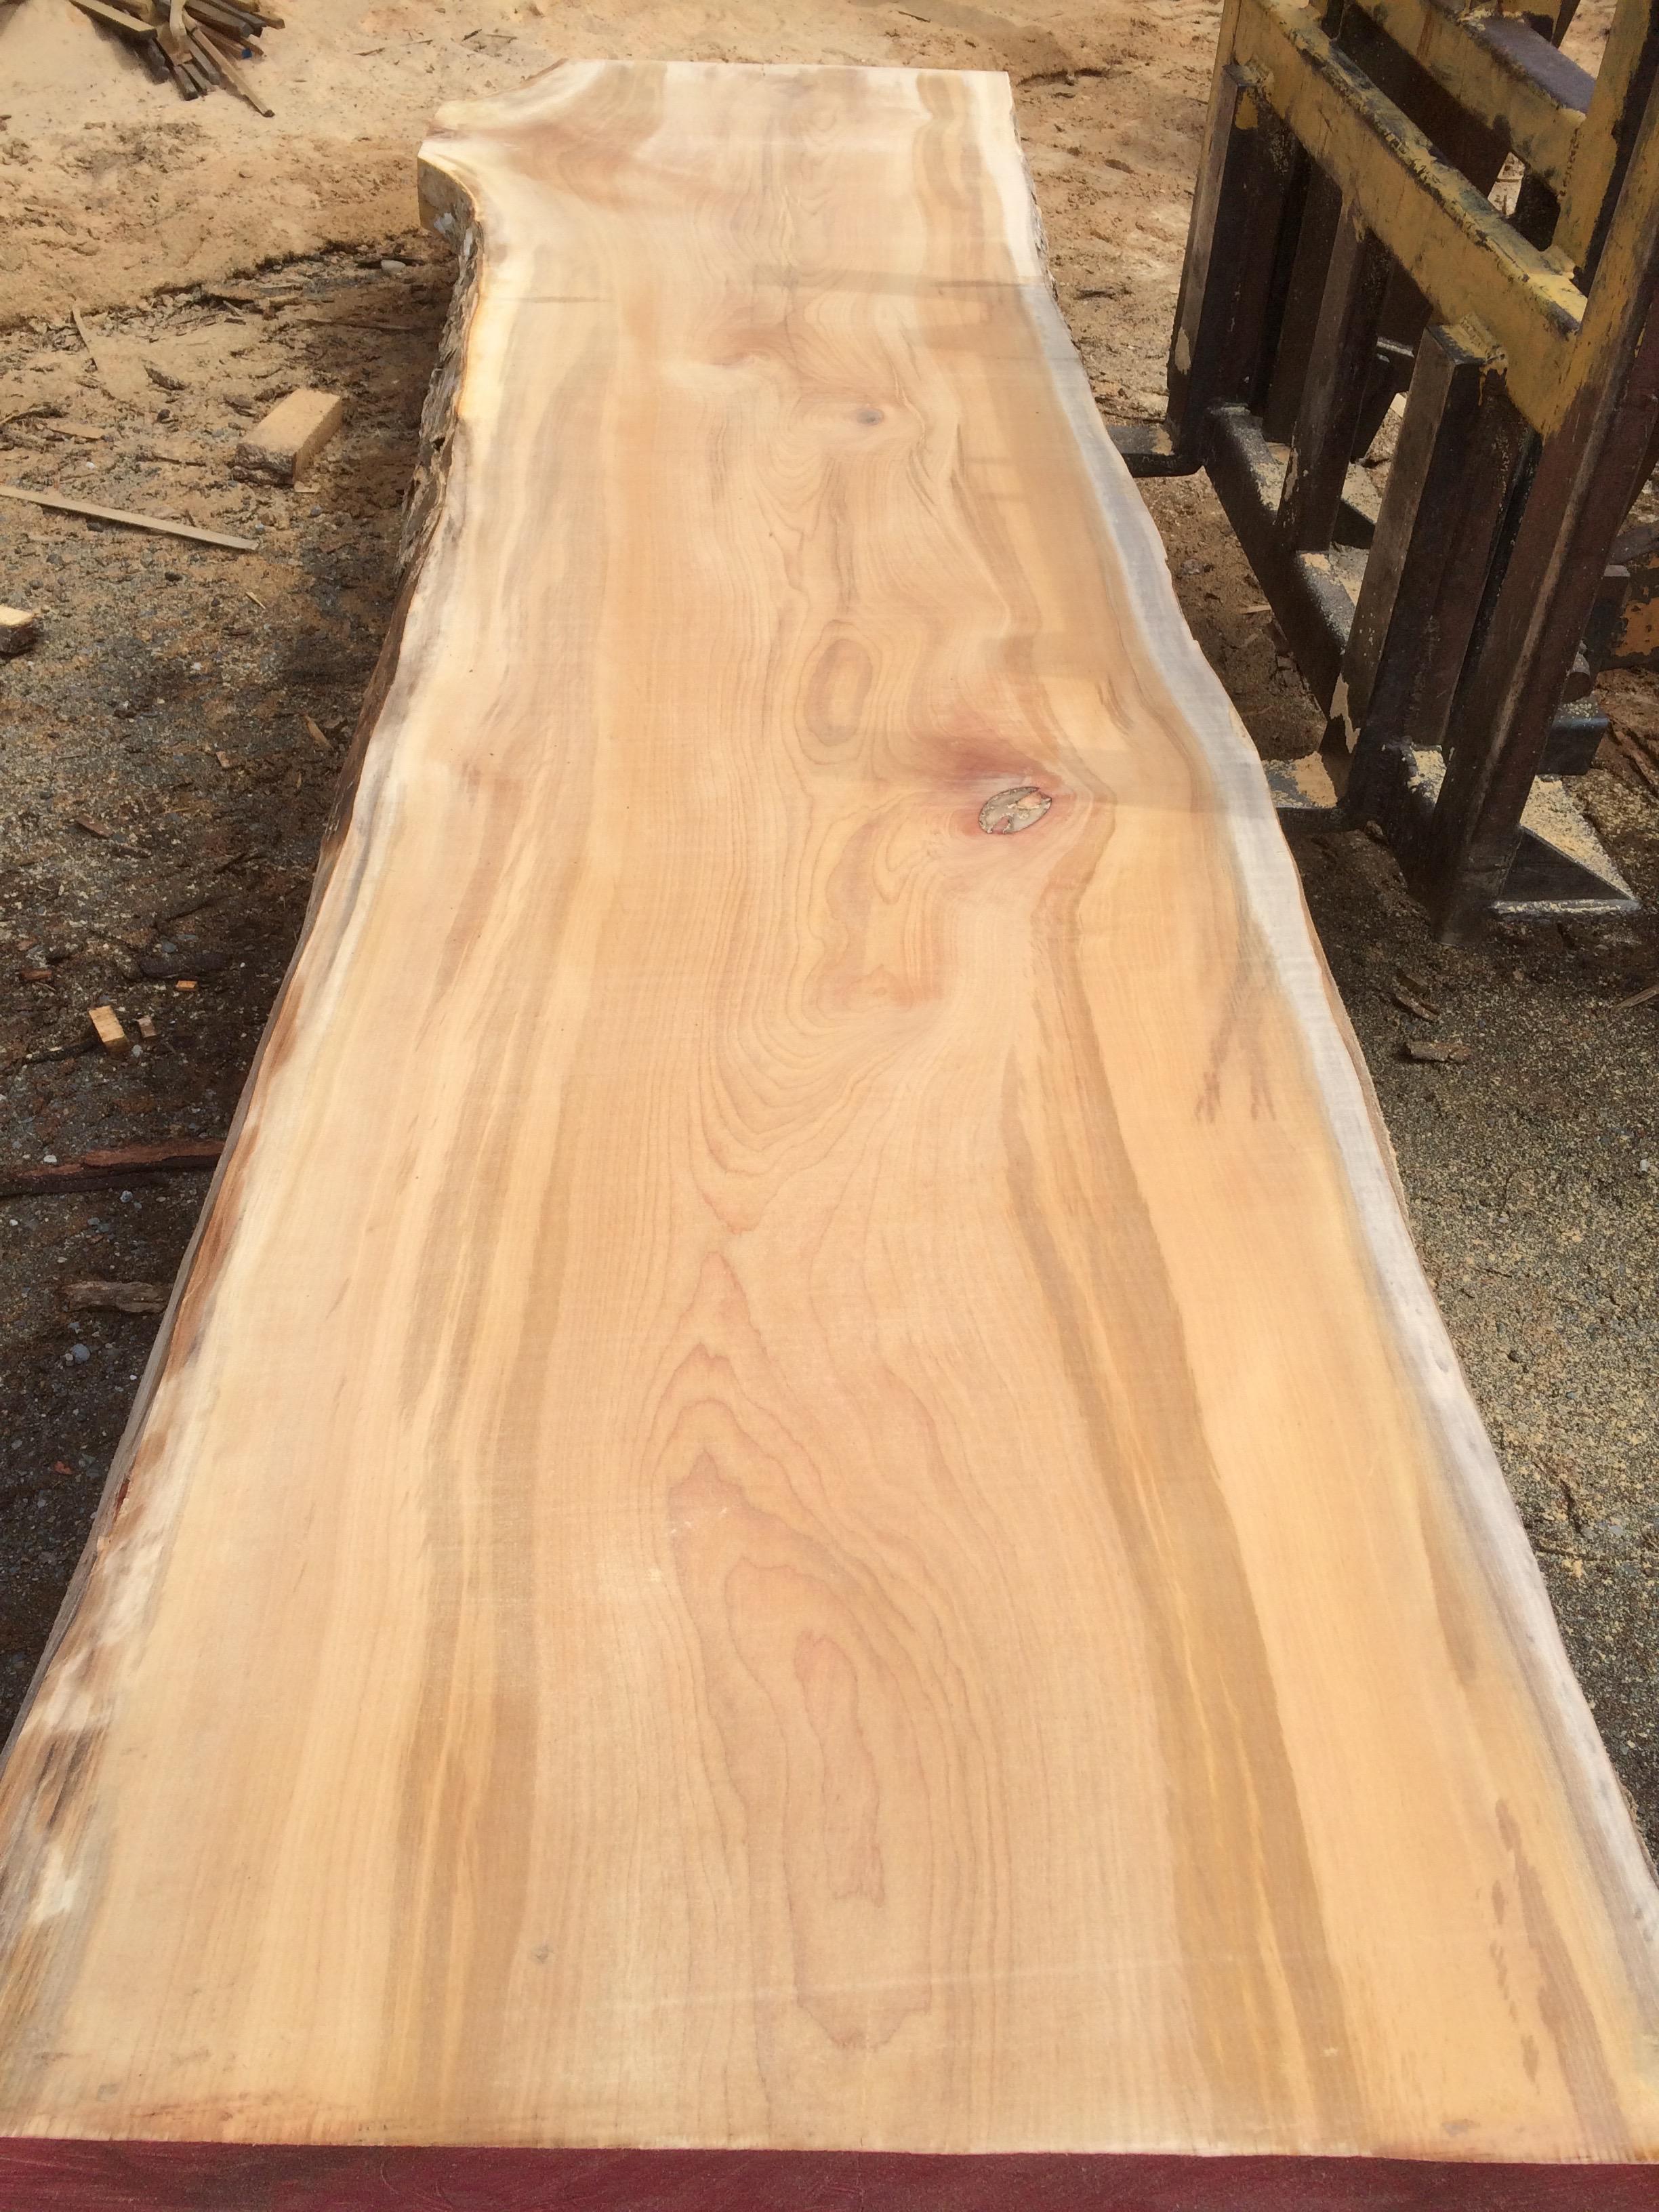 Kerber Farms Lumber Company image 3